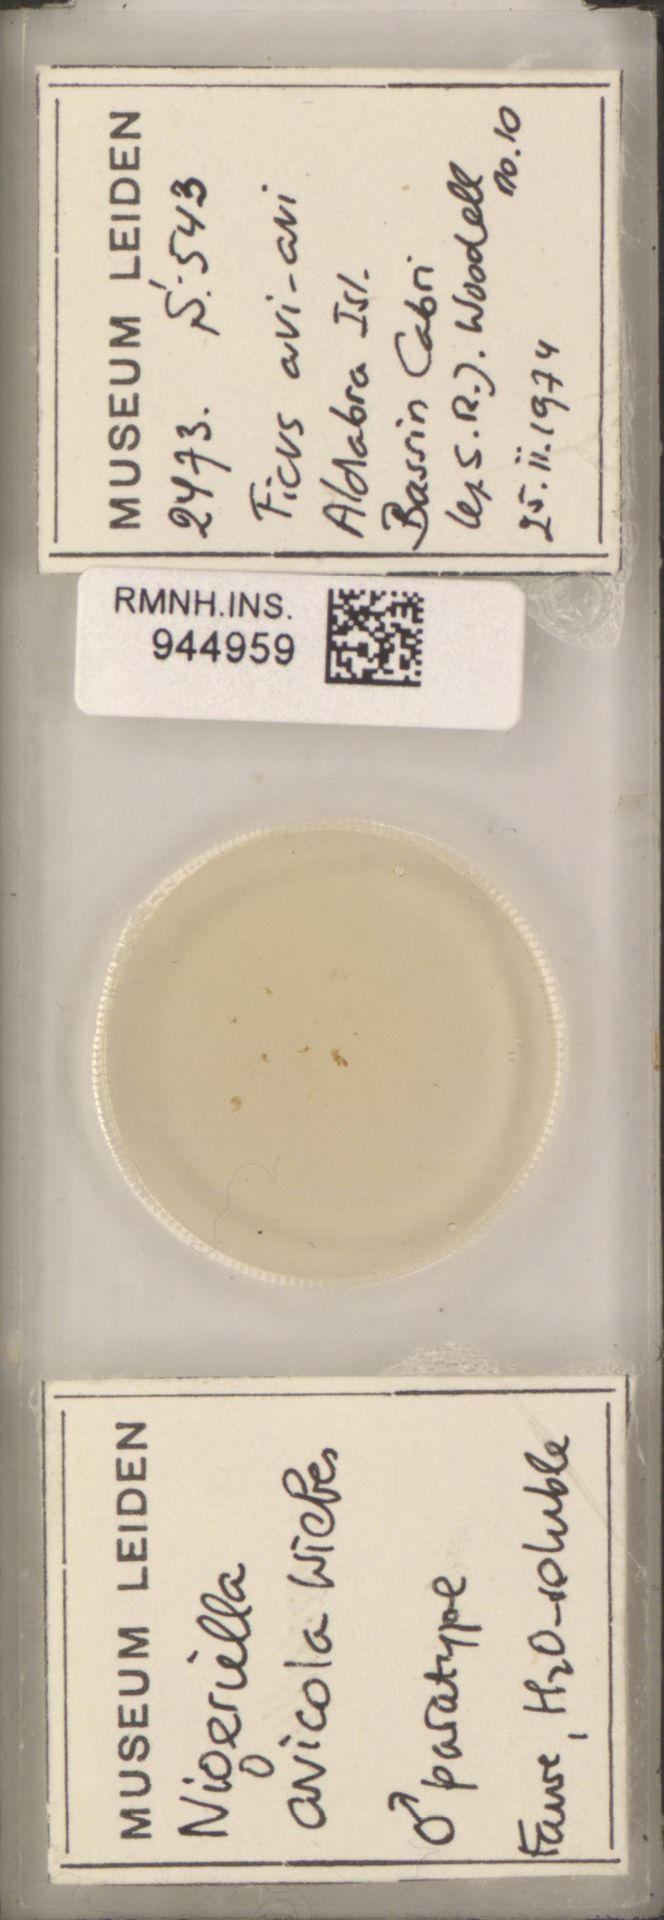 RMNH.INS.944959   Nigeriella avicola Wiebes